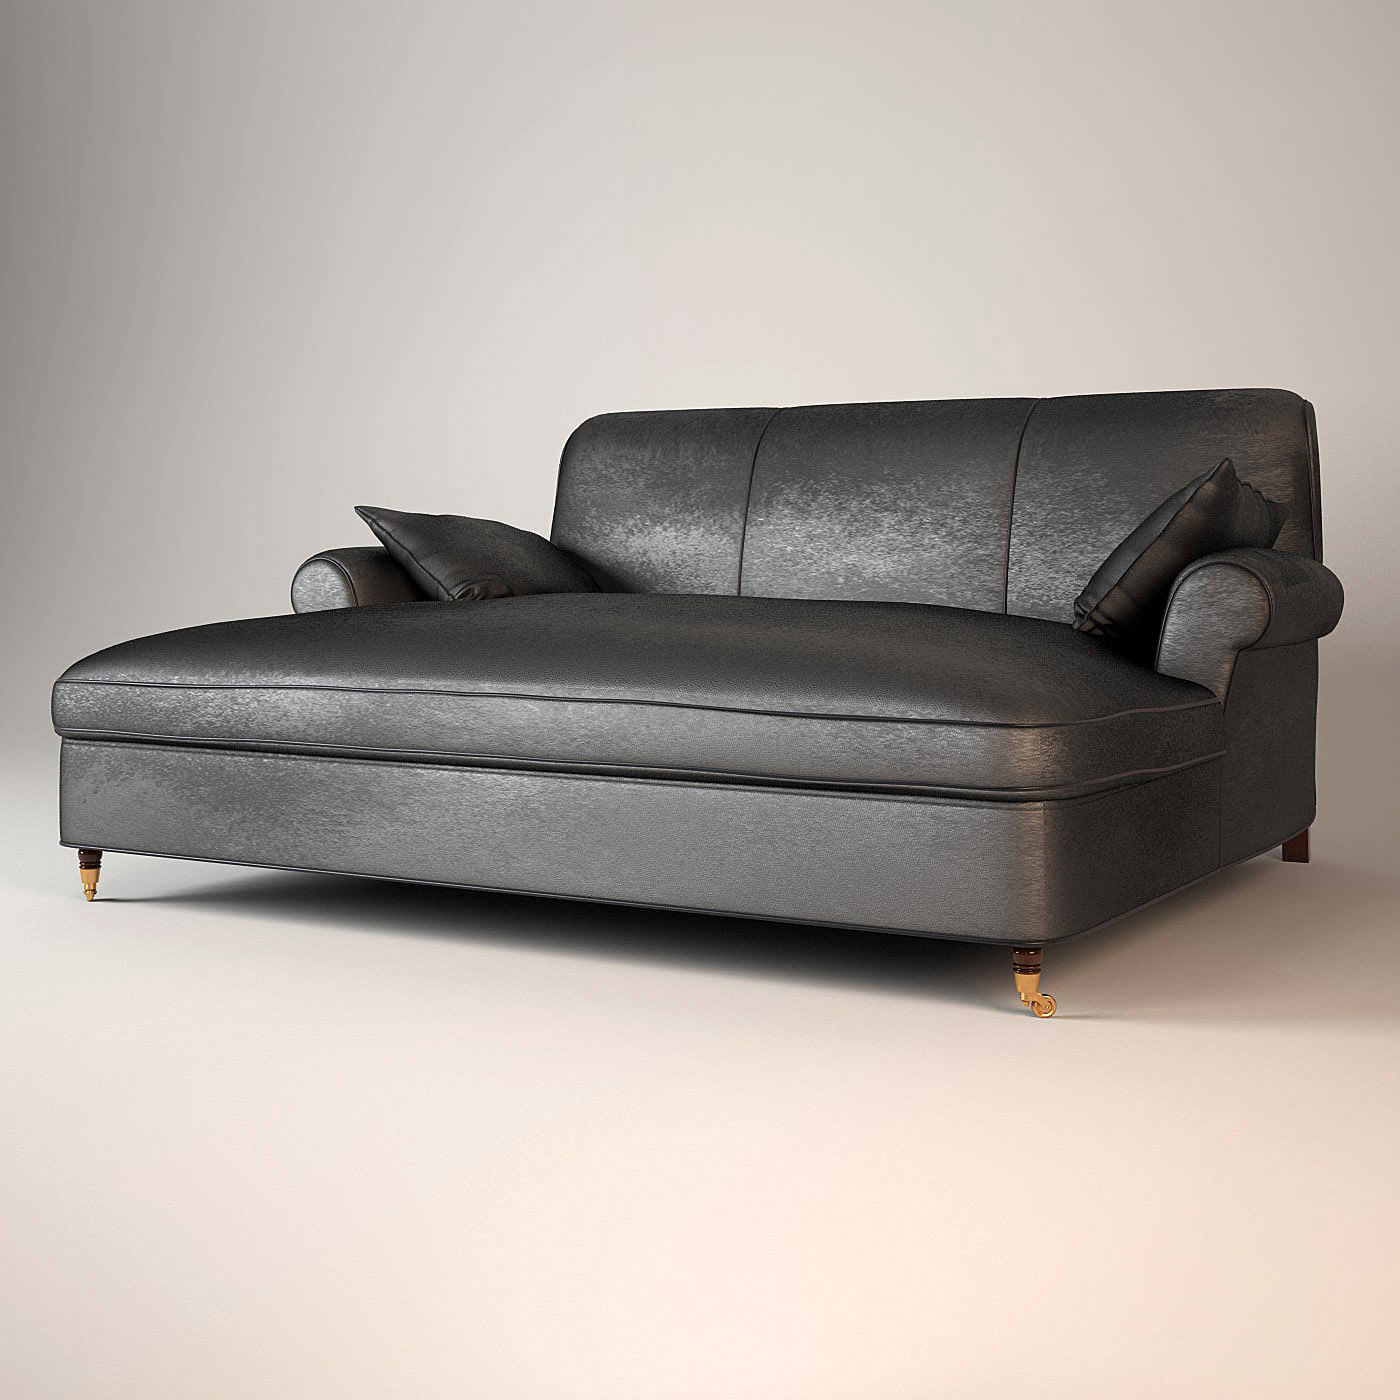 baxter sofa willow sleeper crate and barrel charlotte dormeuse 3d model max obj